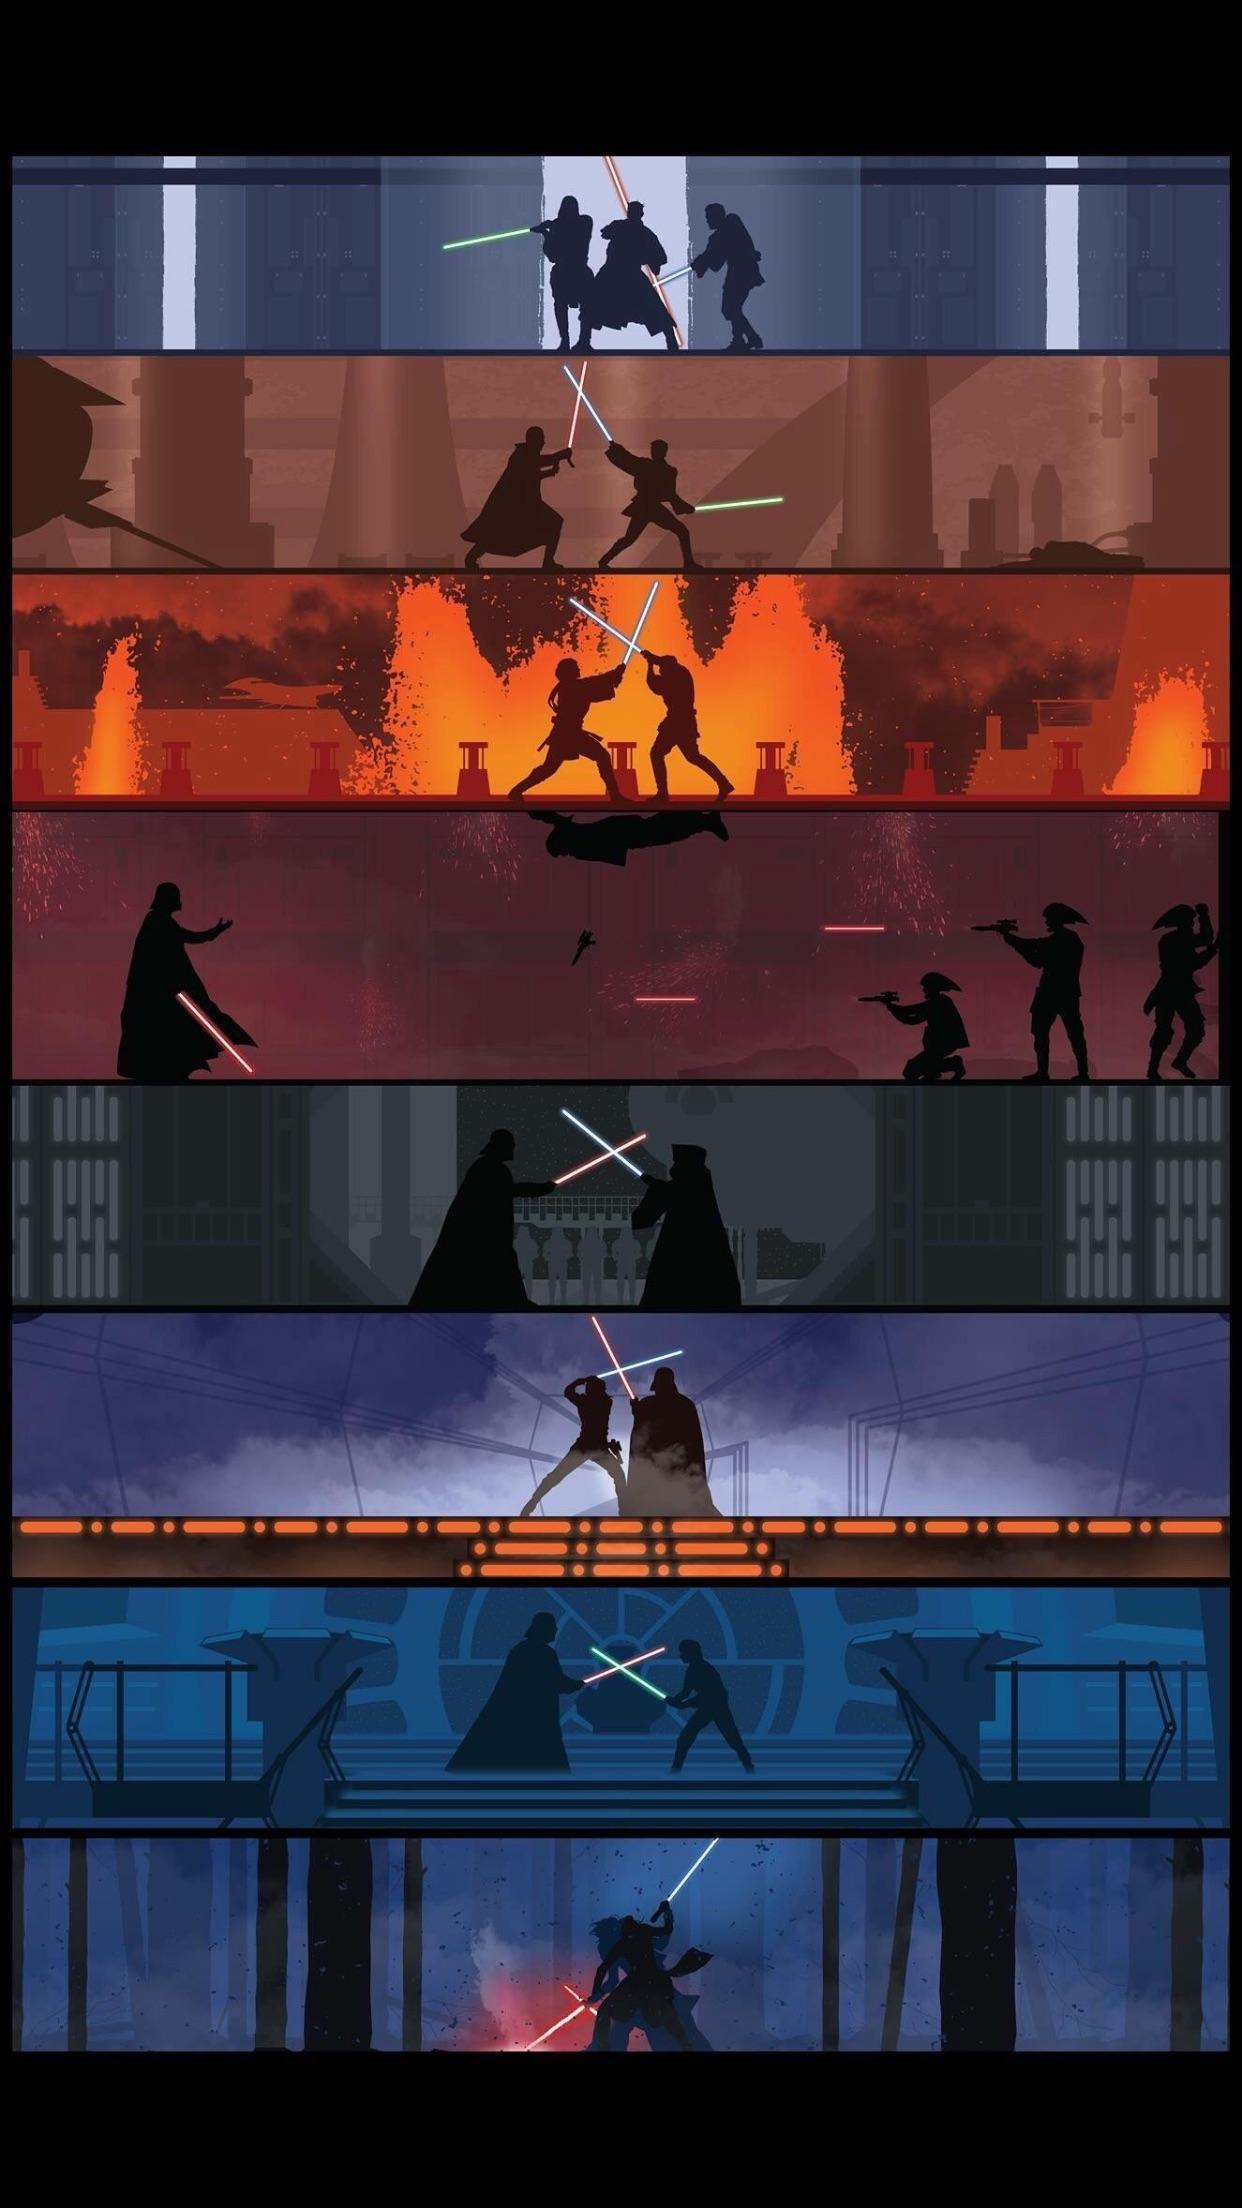 Star Wars Lightsaber Duel Wallpapers - Wallpaper Cave